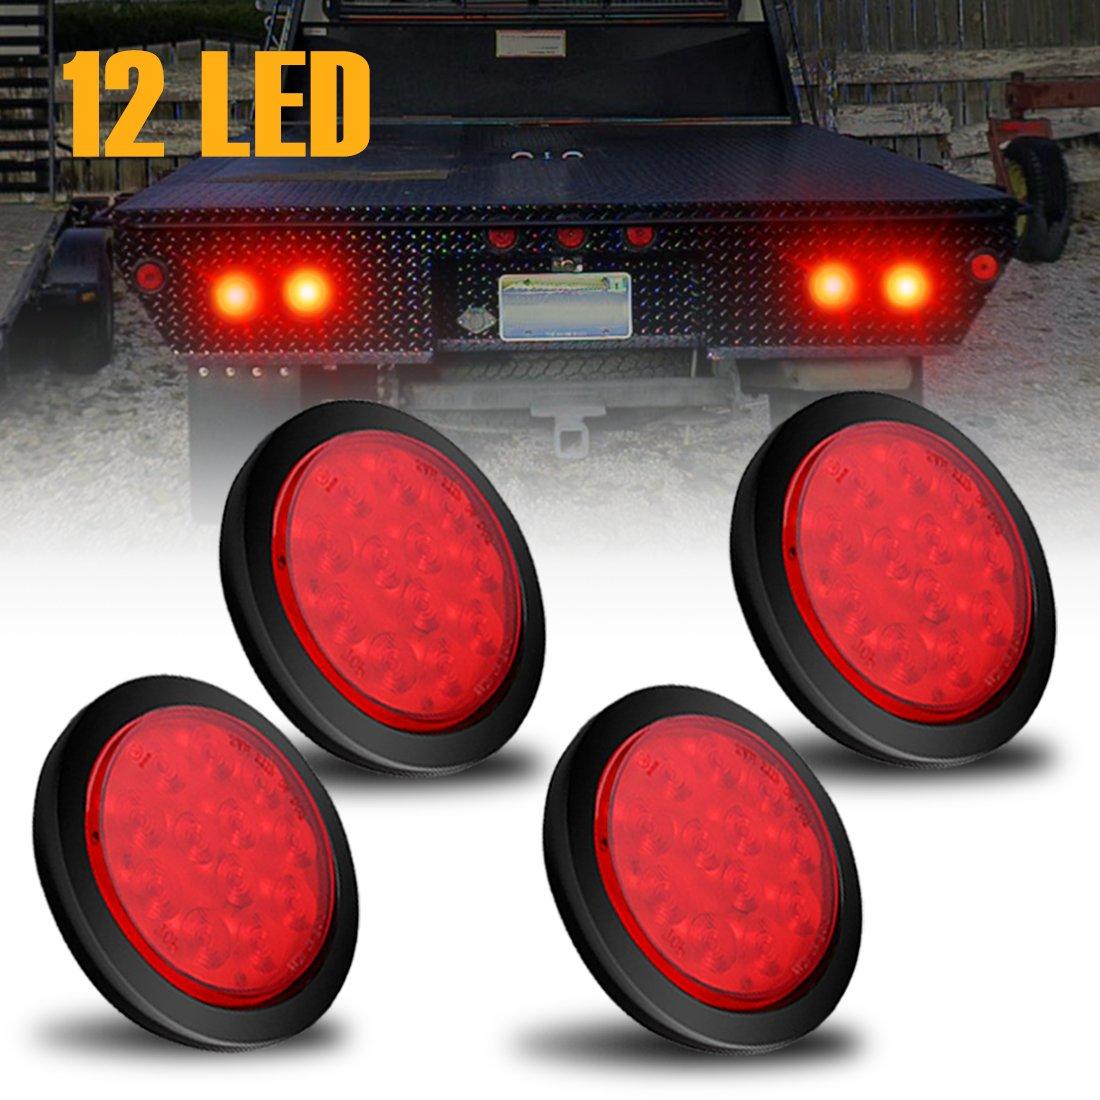 AMBOTHER 4'' Round 12-LED Truck Trailer Brake Stop Turn Marker Tail Light Flush Mount Back-Up Low Profile Light, Waterproof Tight Sealed Grommet Plug for RV Boat Truck Trailer Red DC 12V (Pack of 2)